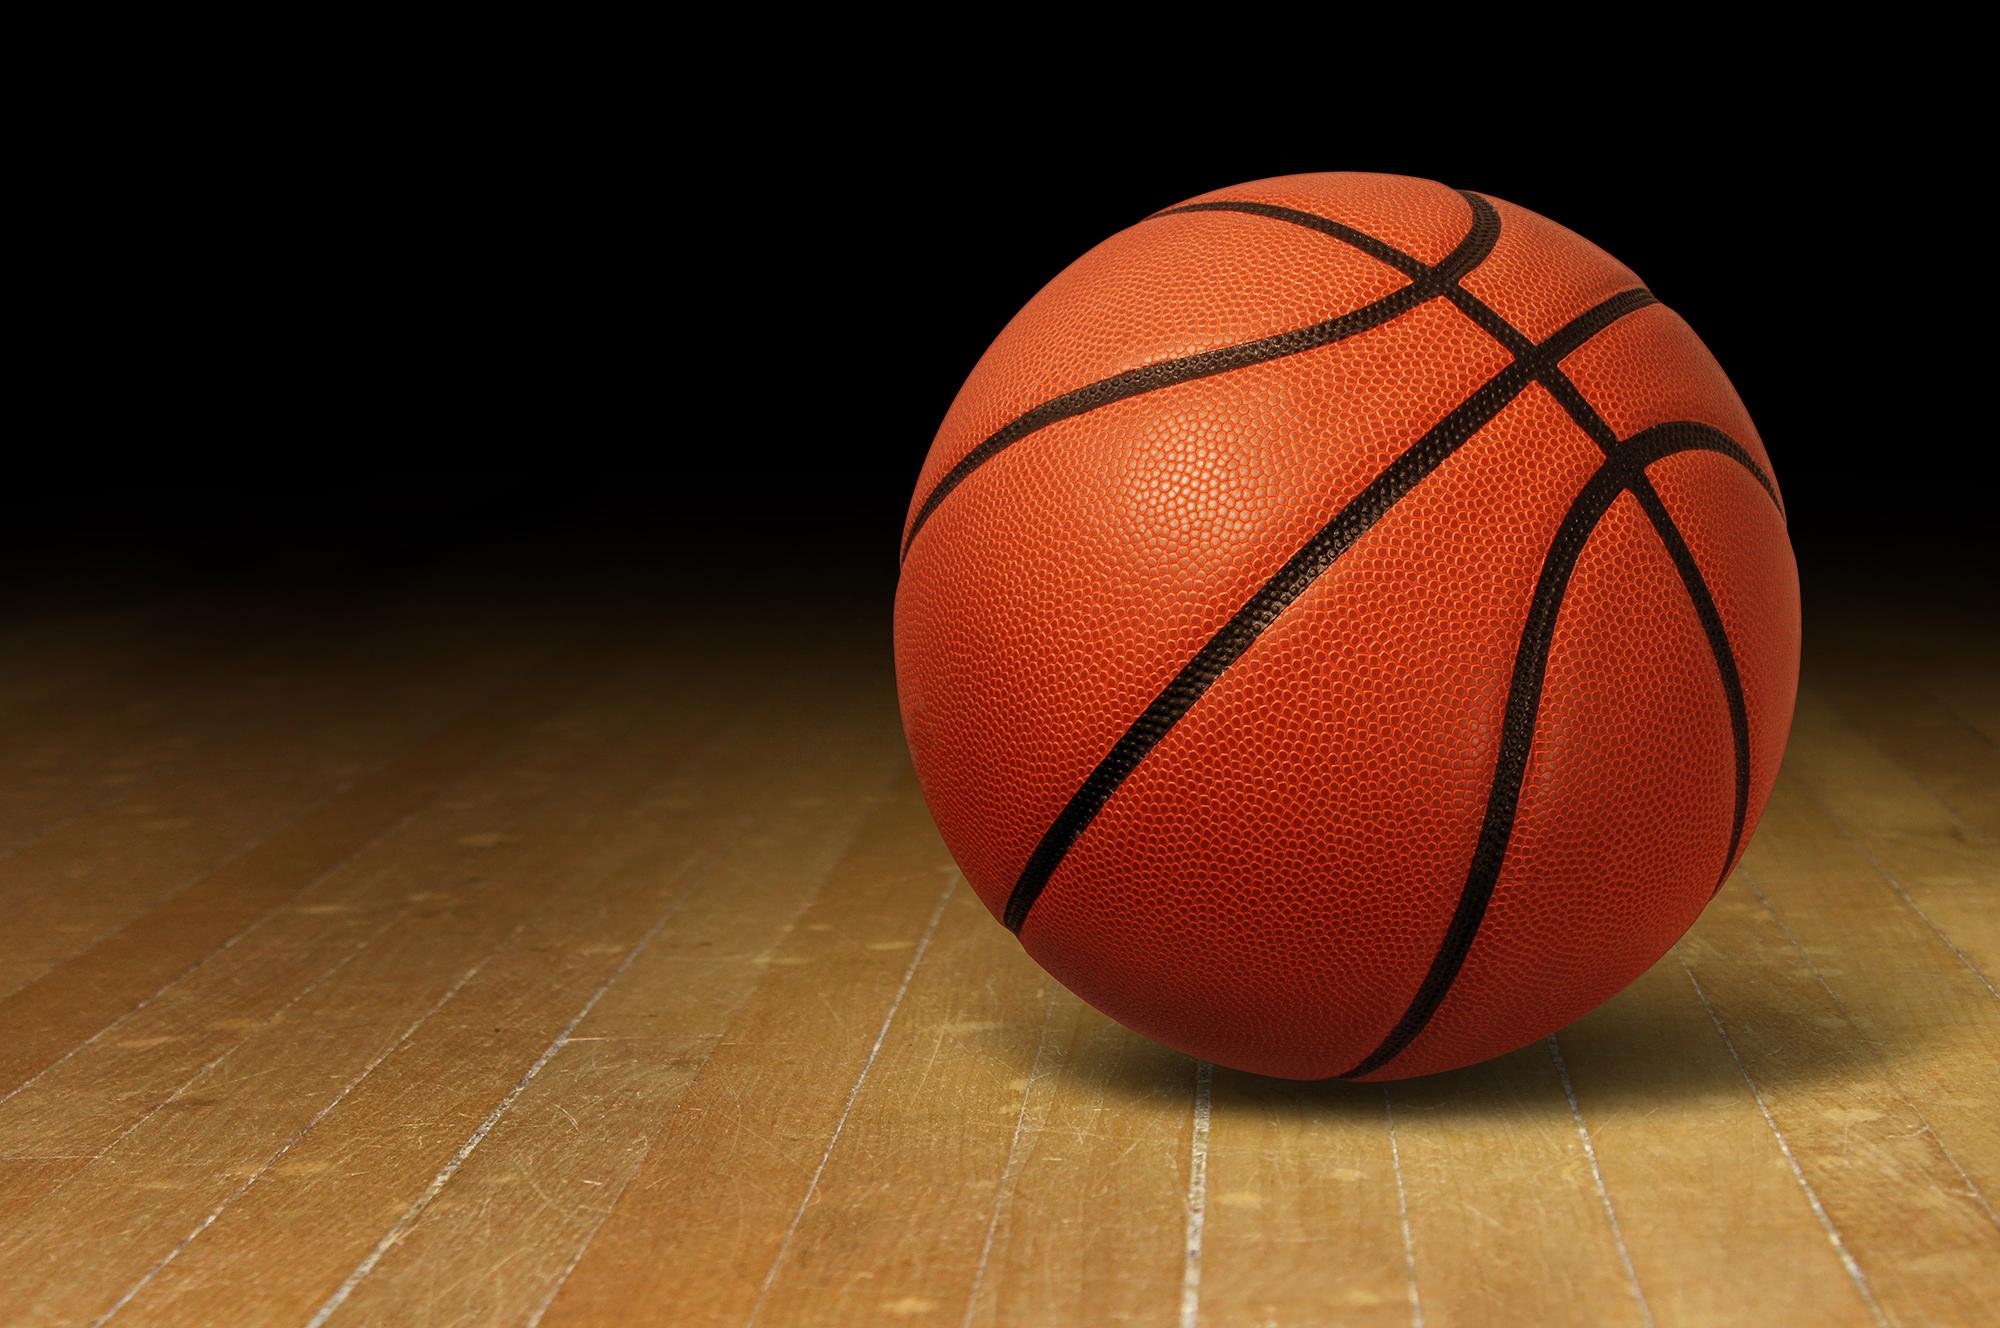 Intramural Basketball League begins